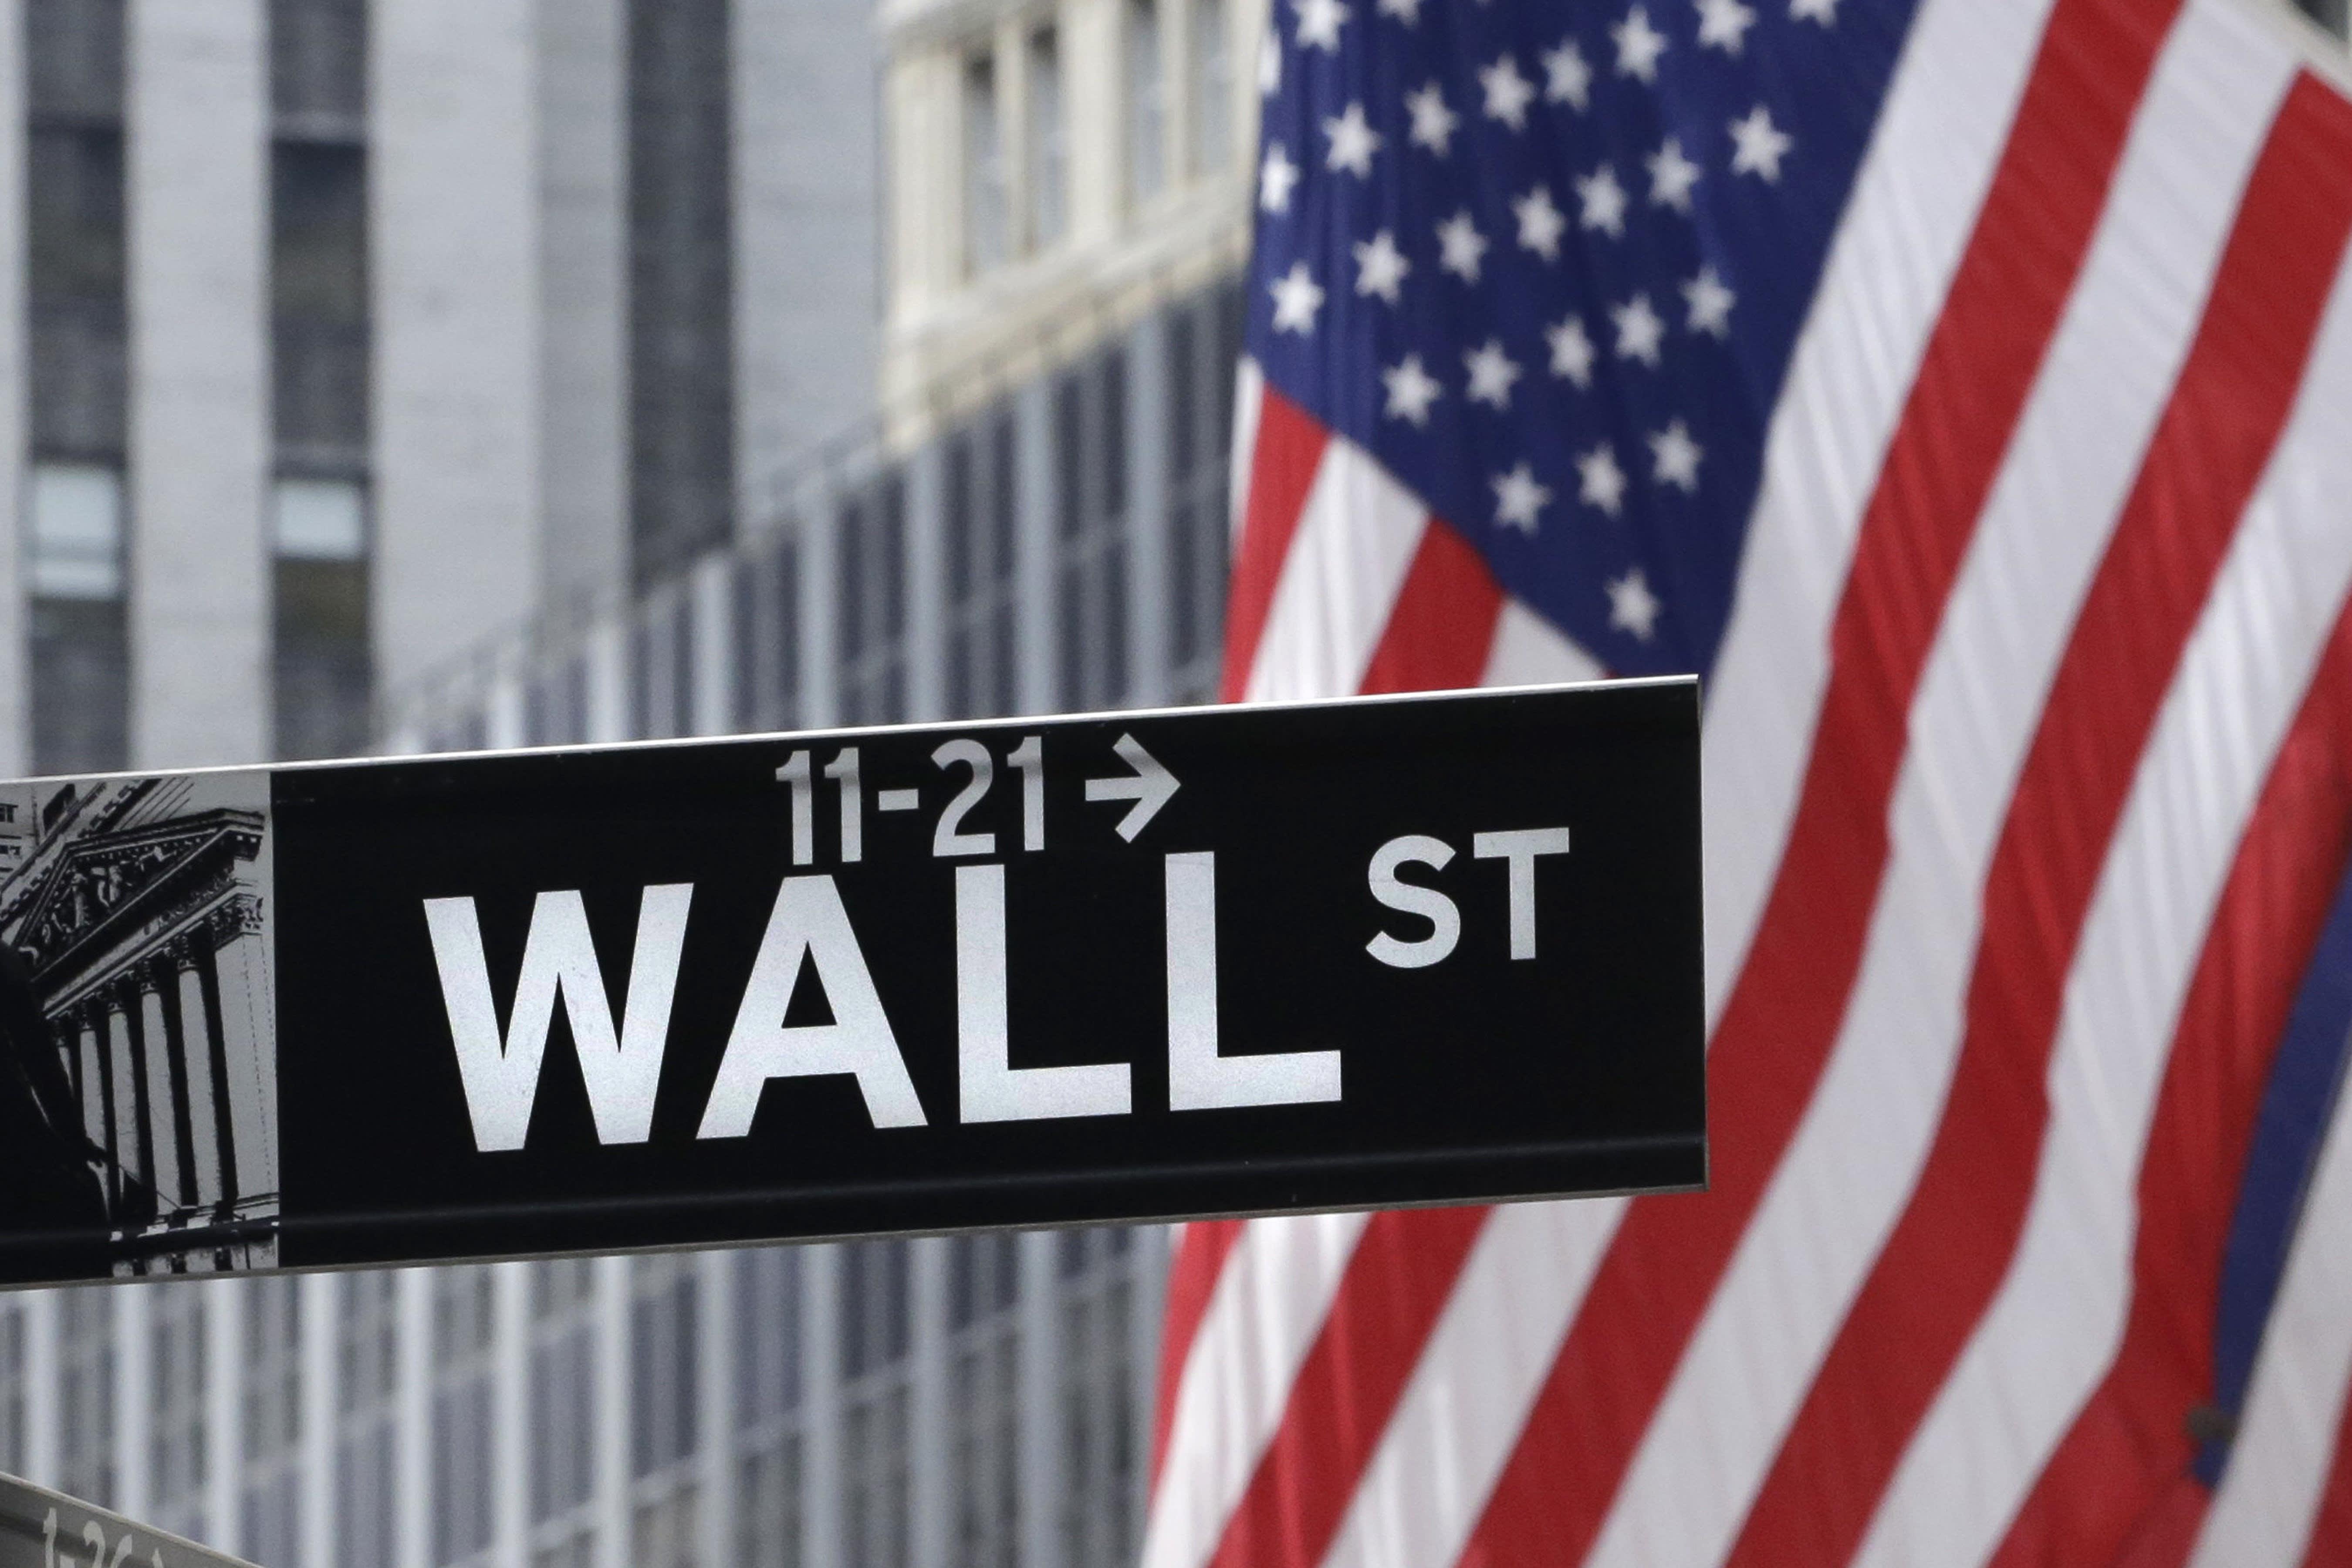 Should US equities form part of a diversified client portfolio?